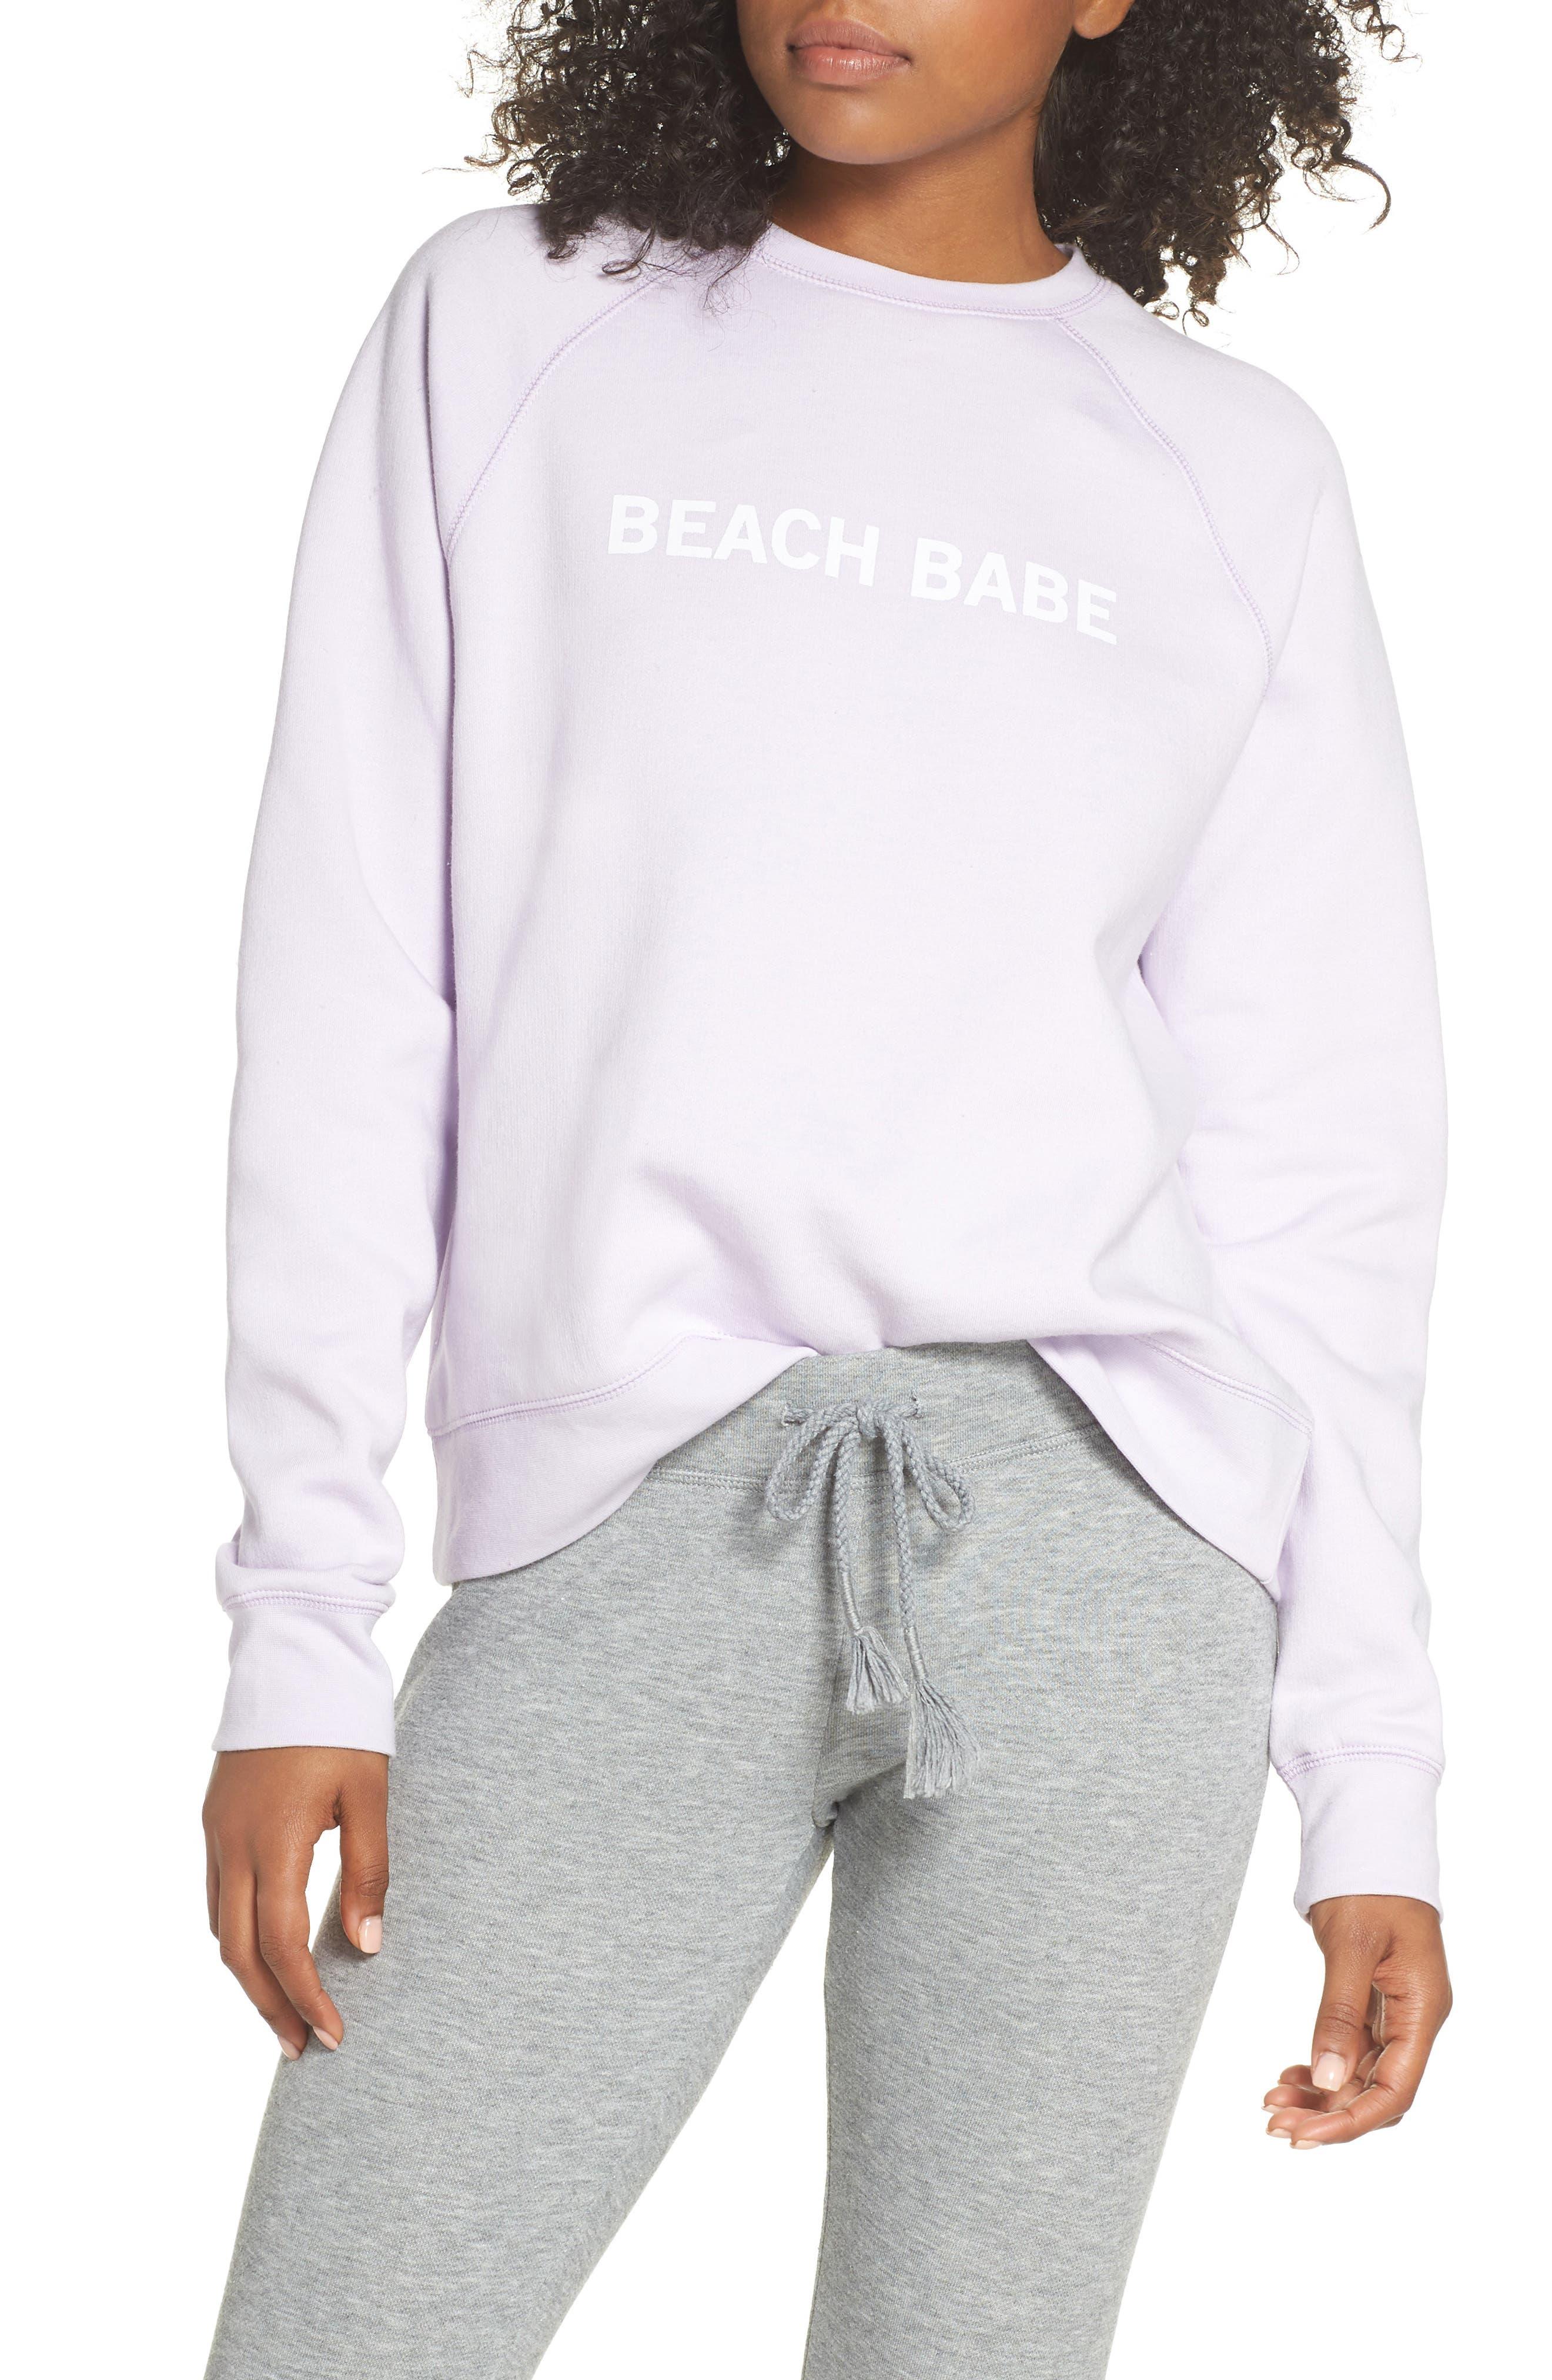 Beach Babe Middle Sister Crewneck Sweatshirt,                         Main,                         color, Soft Lavender